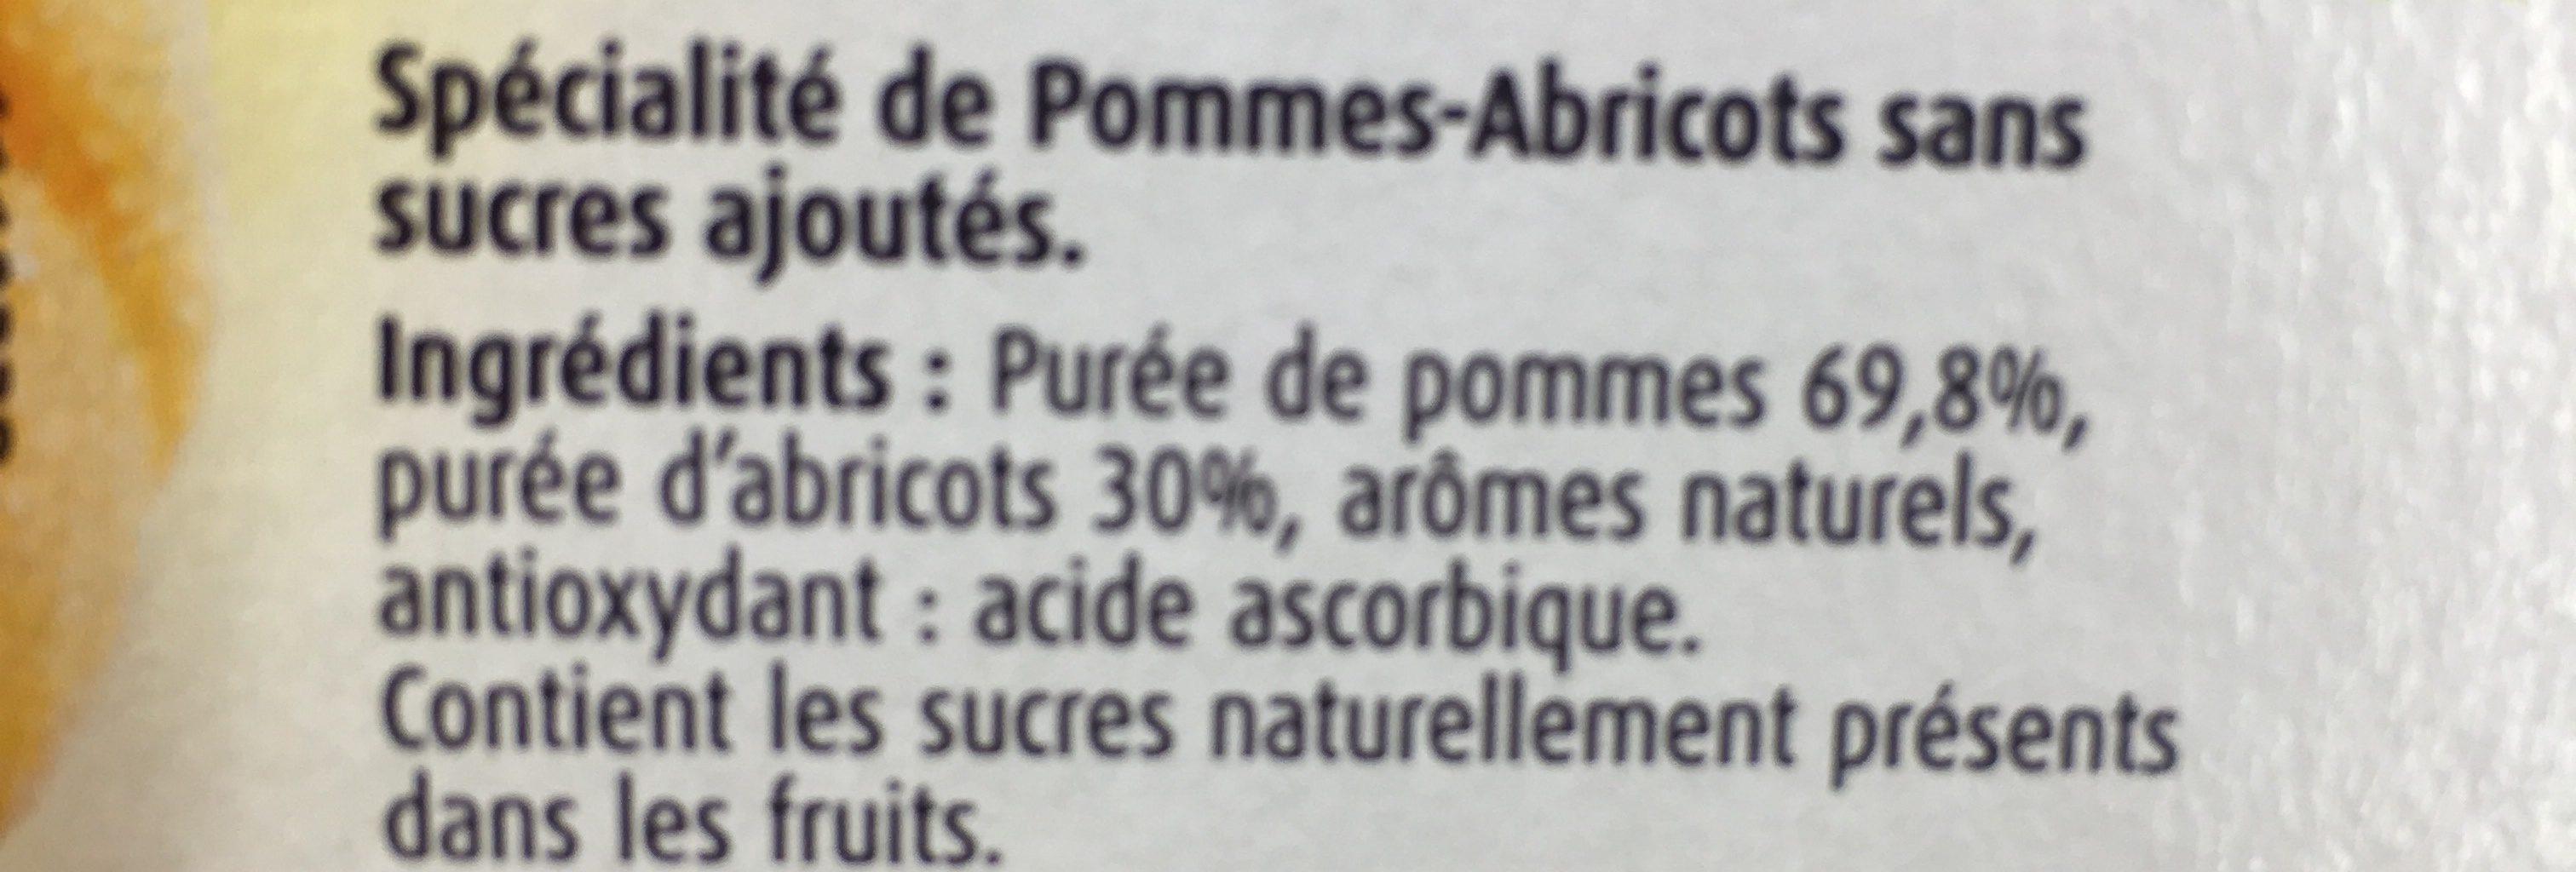 Dessert fruitier pomme abricot Charles & Alice + pomme x4 - Ingrédients - fr